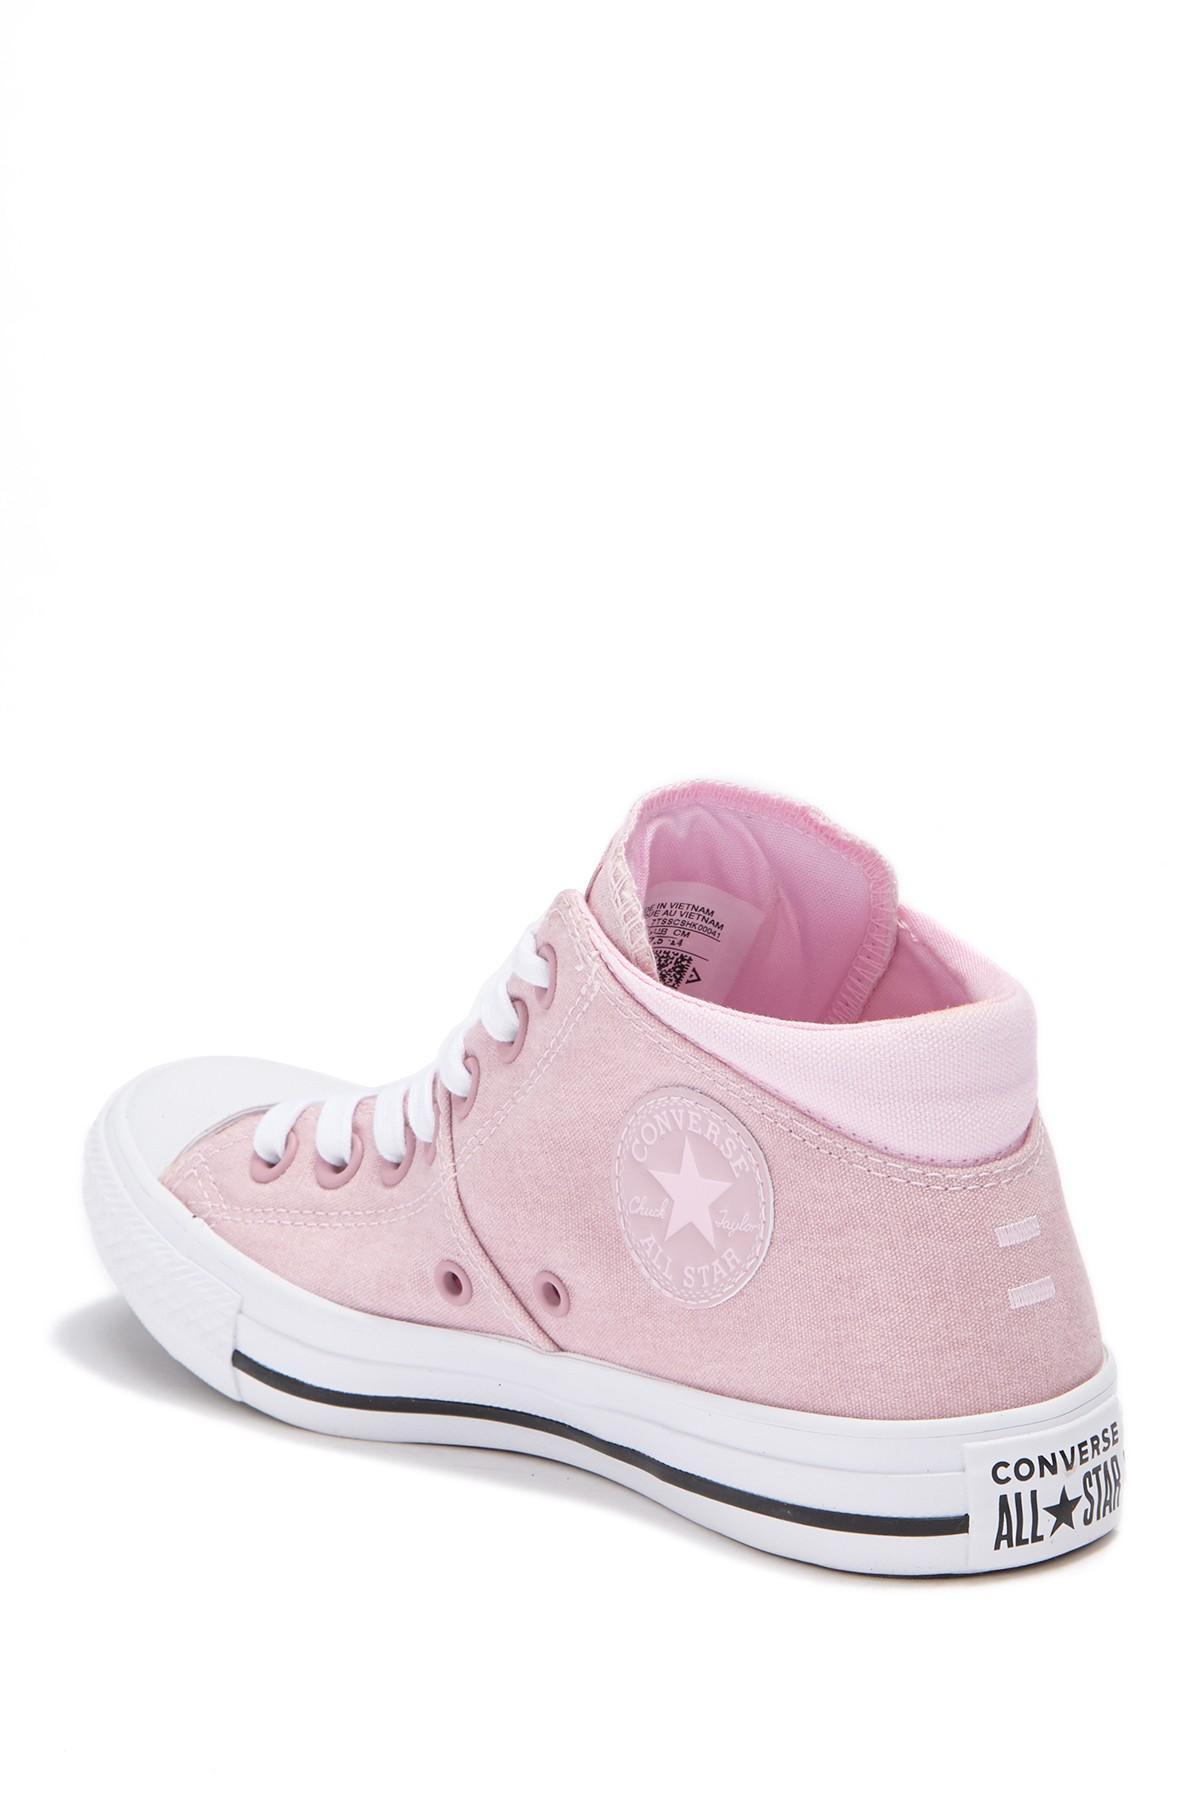 4b4d3035adac Converse - Pink Chuck Taylor All Star Madison Mid Top Sneaker (women) -  Lyst. View fullscreen